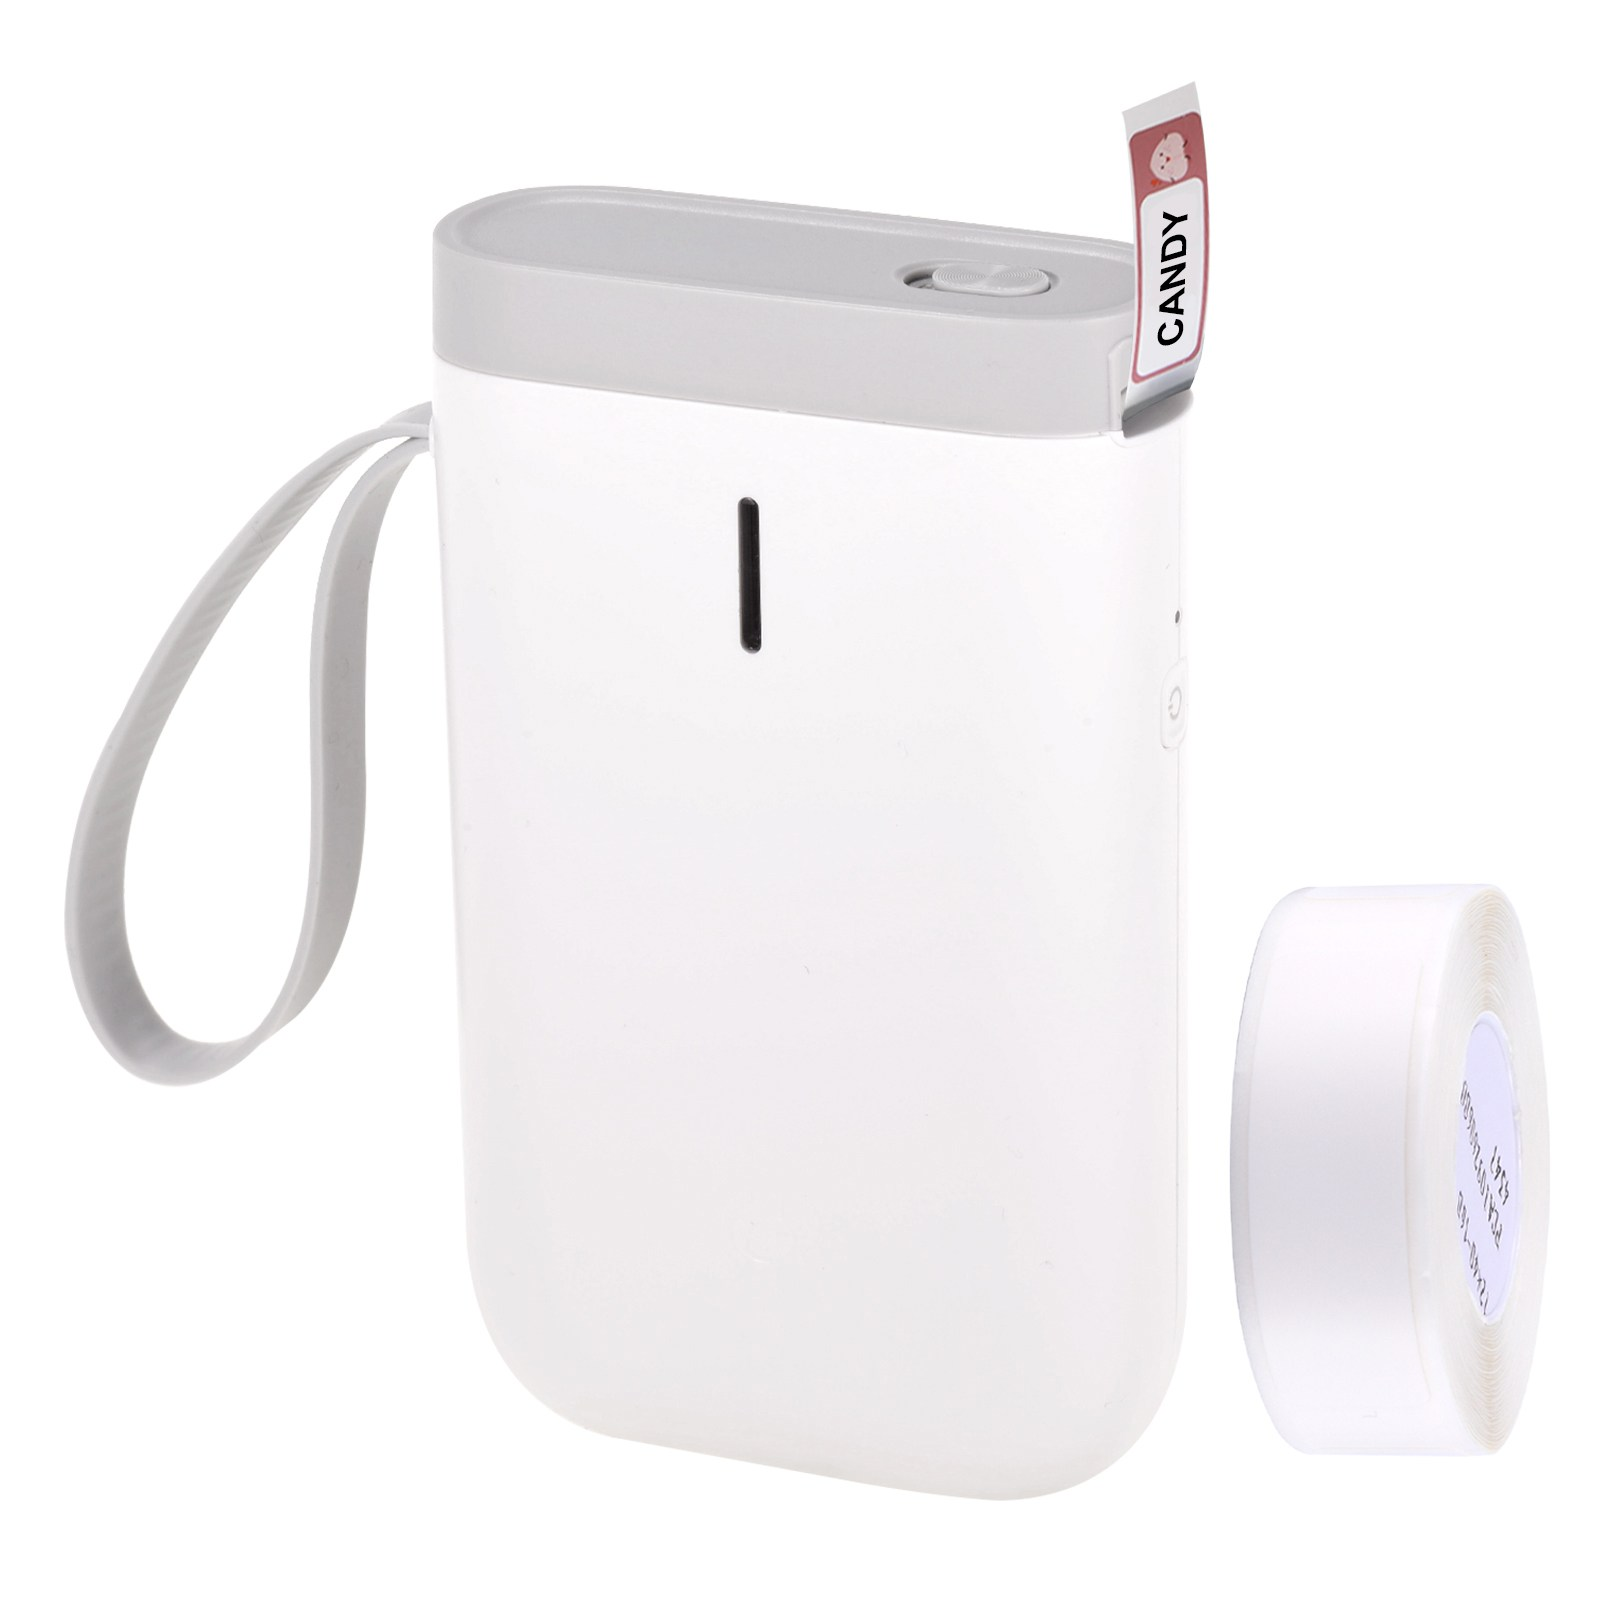 JINGCHEN 휴대용 라벨프린터 블루투스 미니  D11 라벨지1롤 증정, D11화이트 (POP 1262525631)